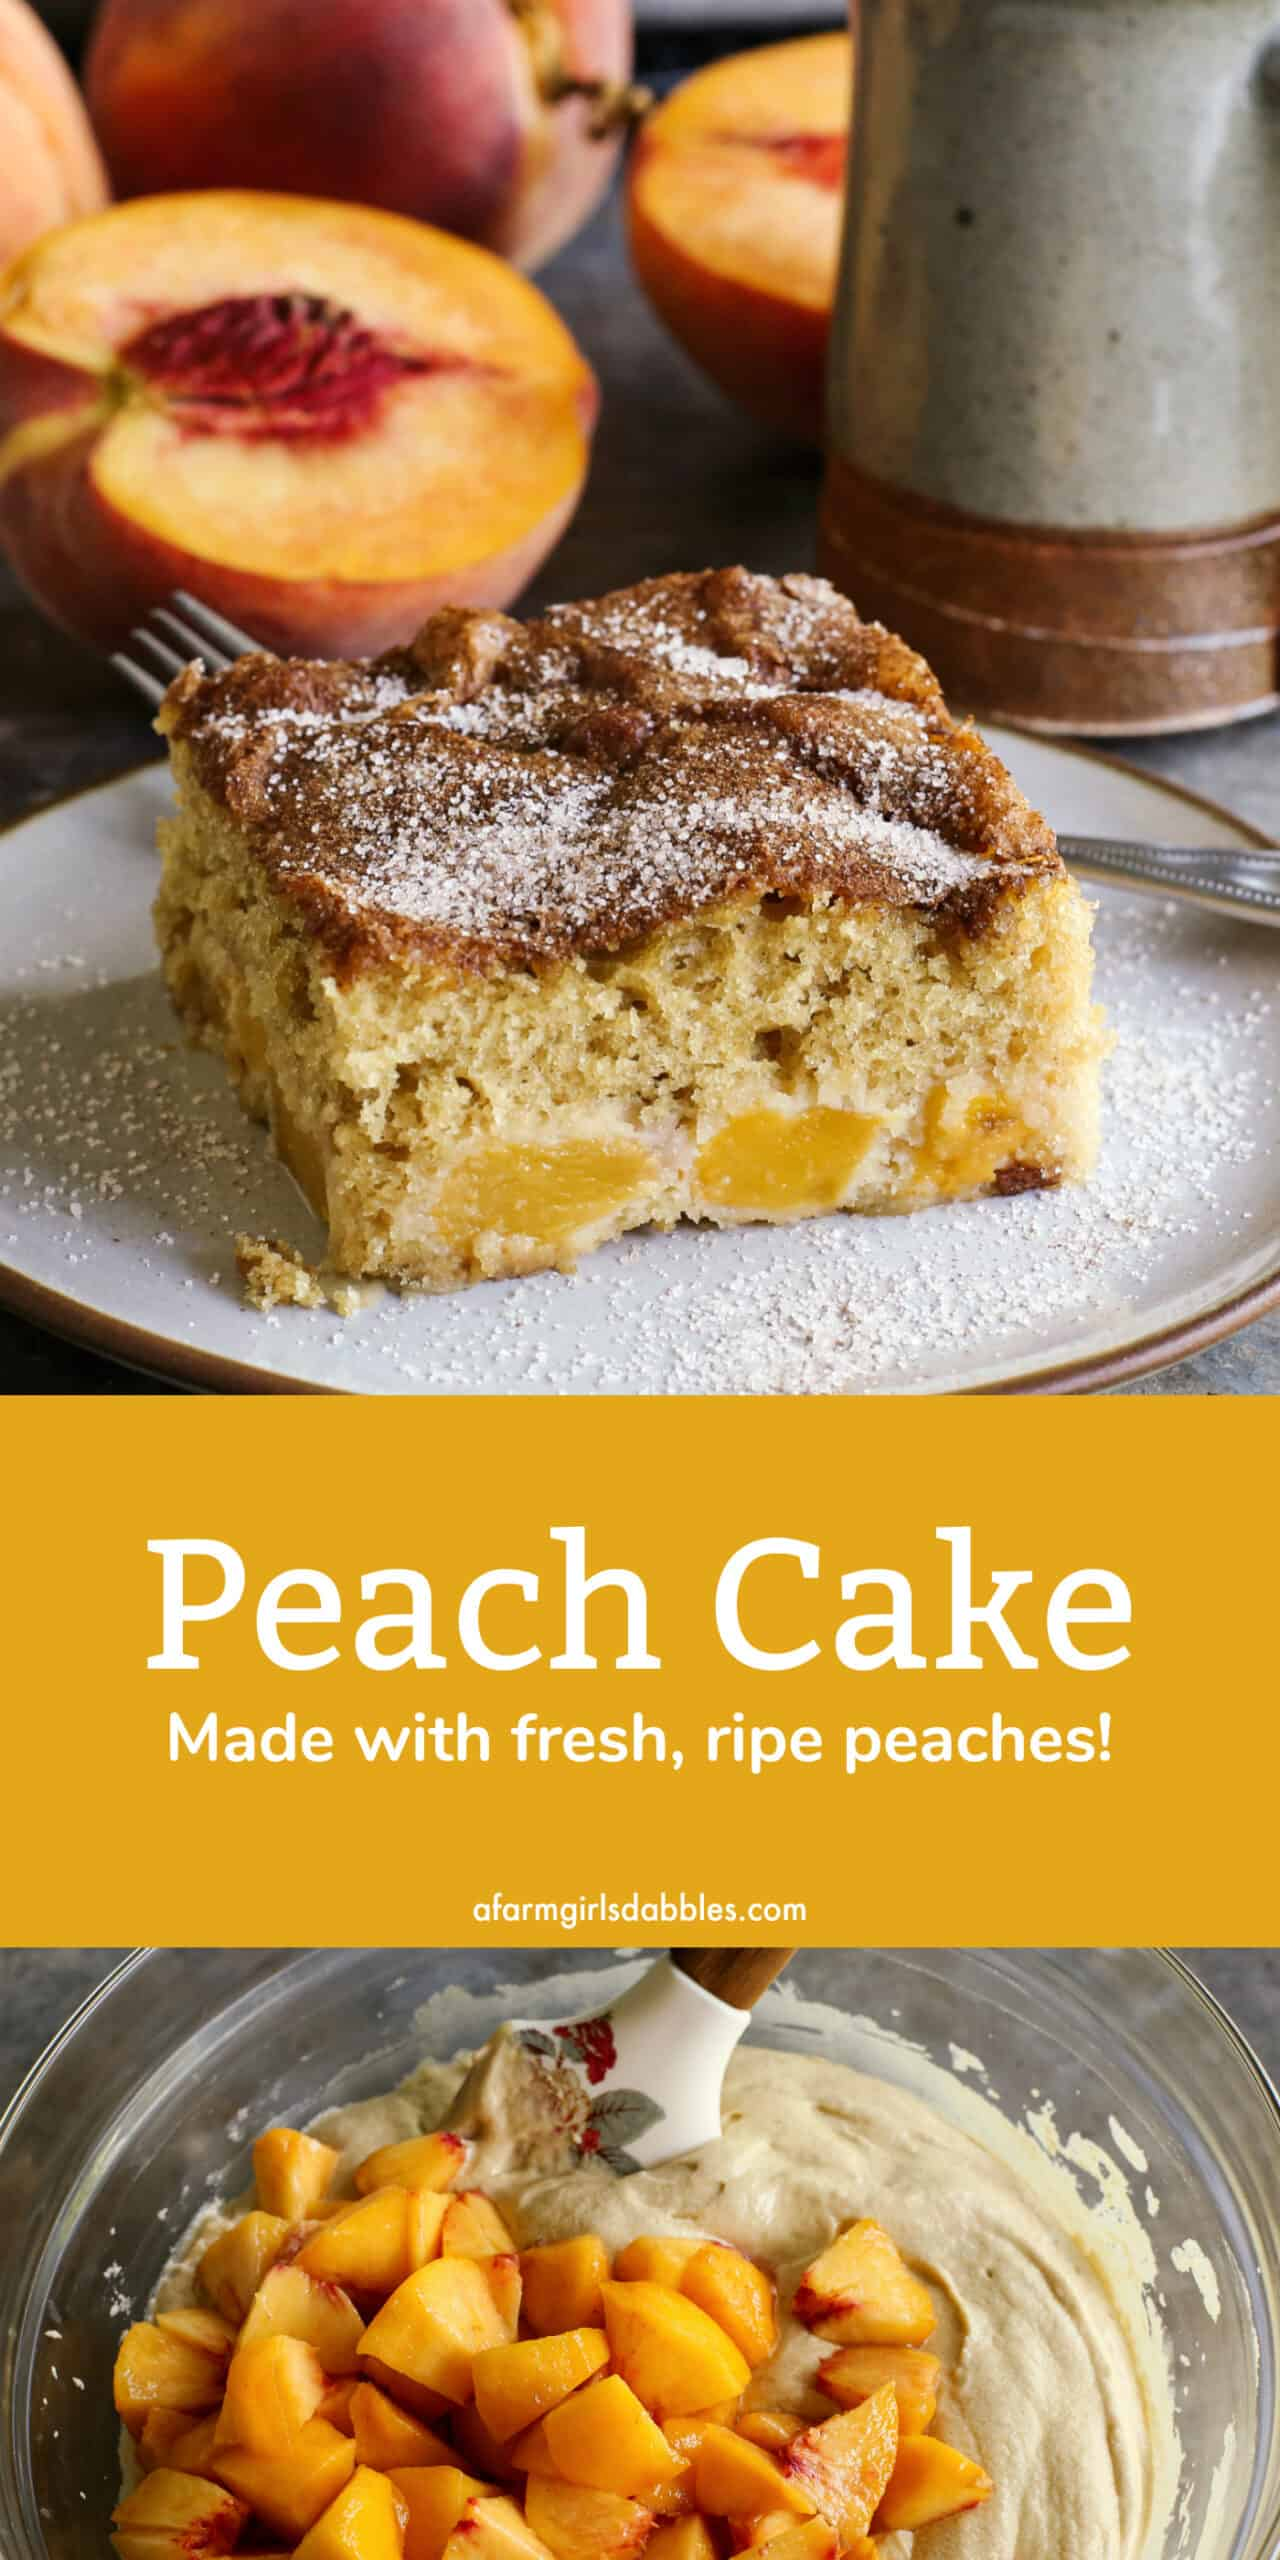 Pinterest image of peach cake